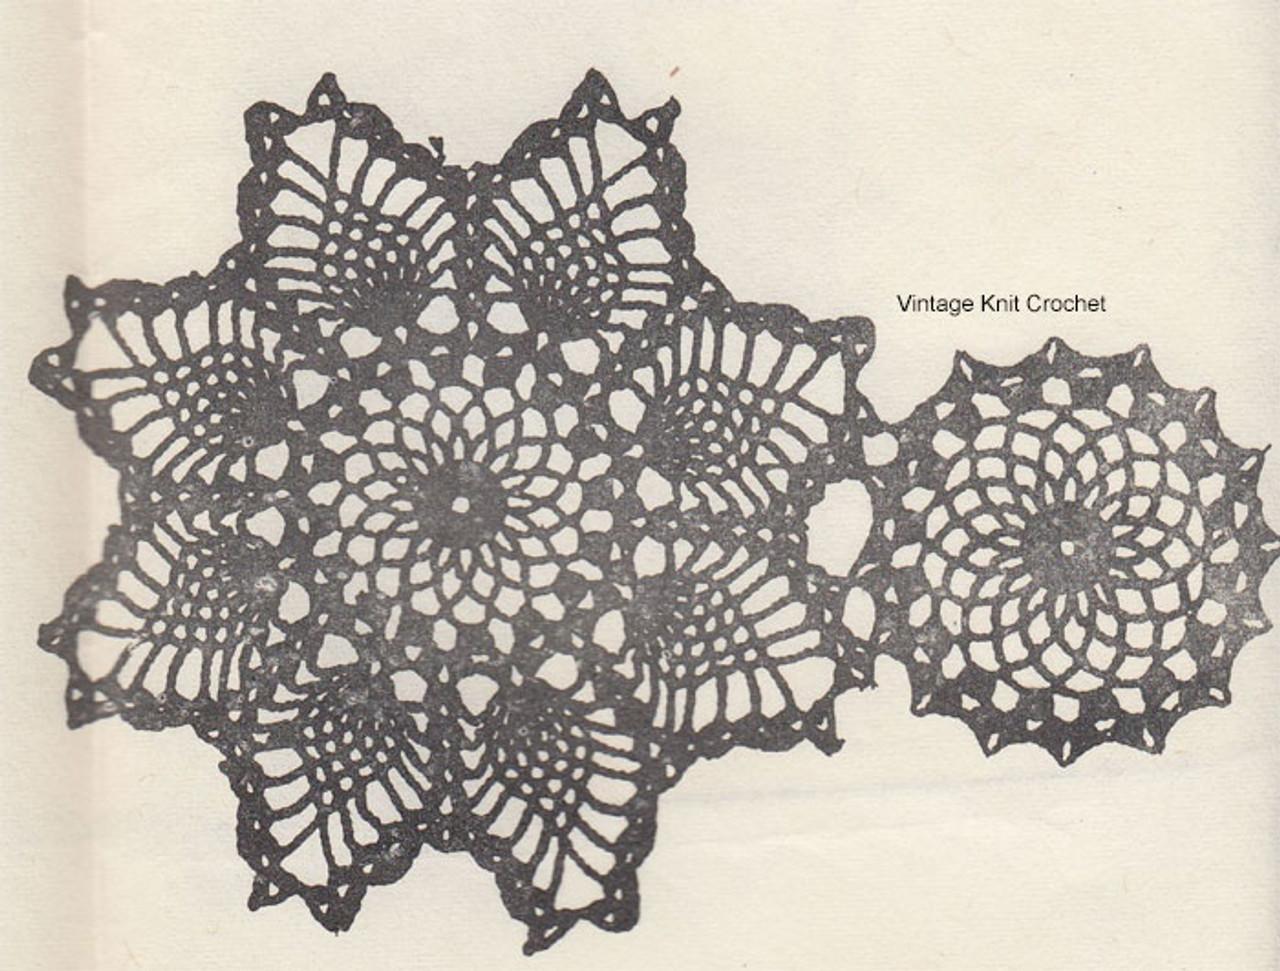 Crochet Pineapple Medallion and Fill Motif